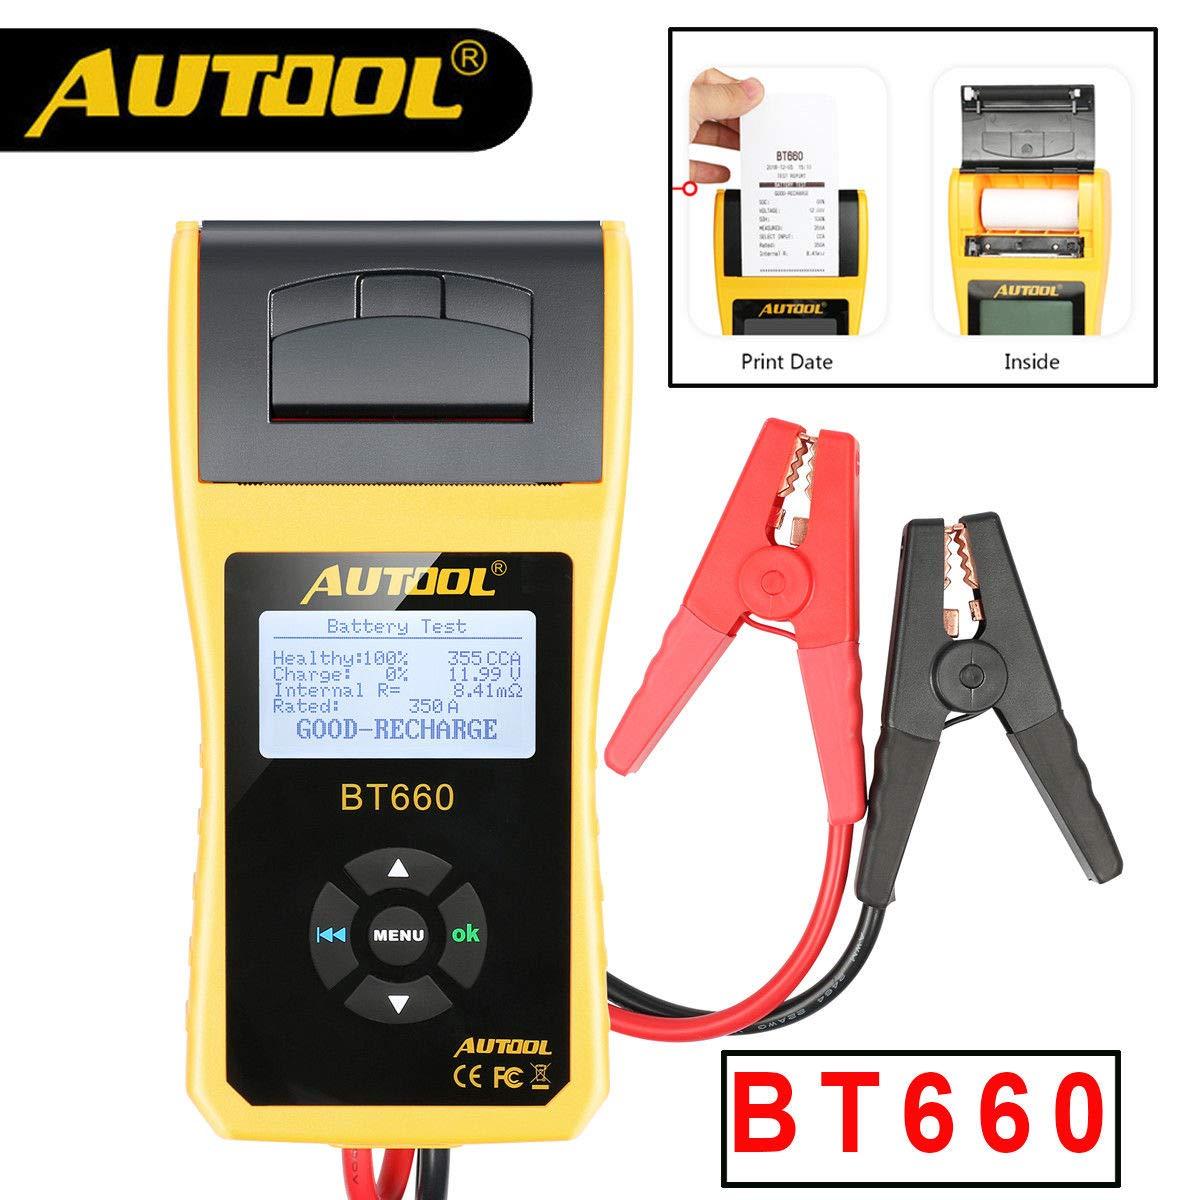 WonVon 12V Car Battery Load Tester and Analyzer,AUTOOL BT660 12V/24V Car Battery System Tester Cranking/Charging Test with Printer for Heavy Duty Trucks Cars ATV by WonVon (Image #2)